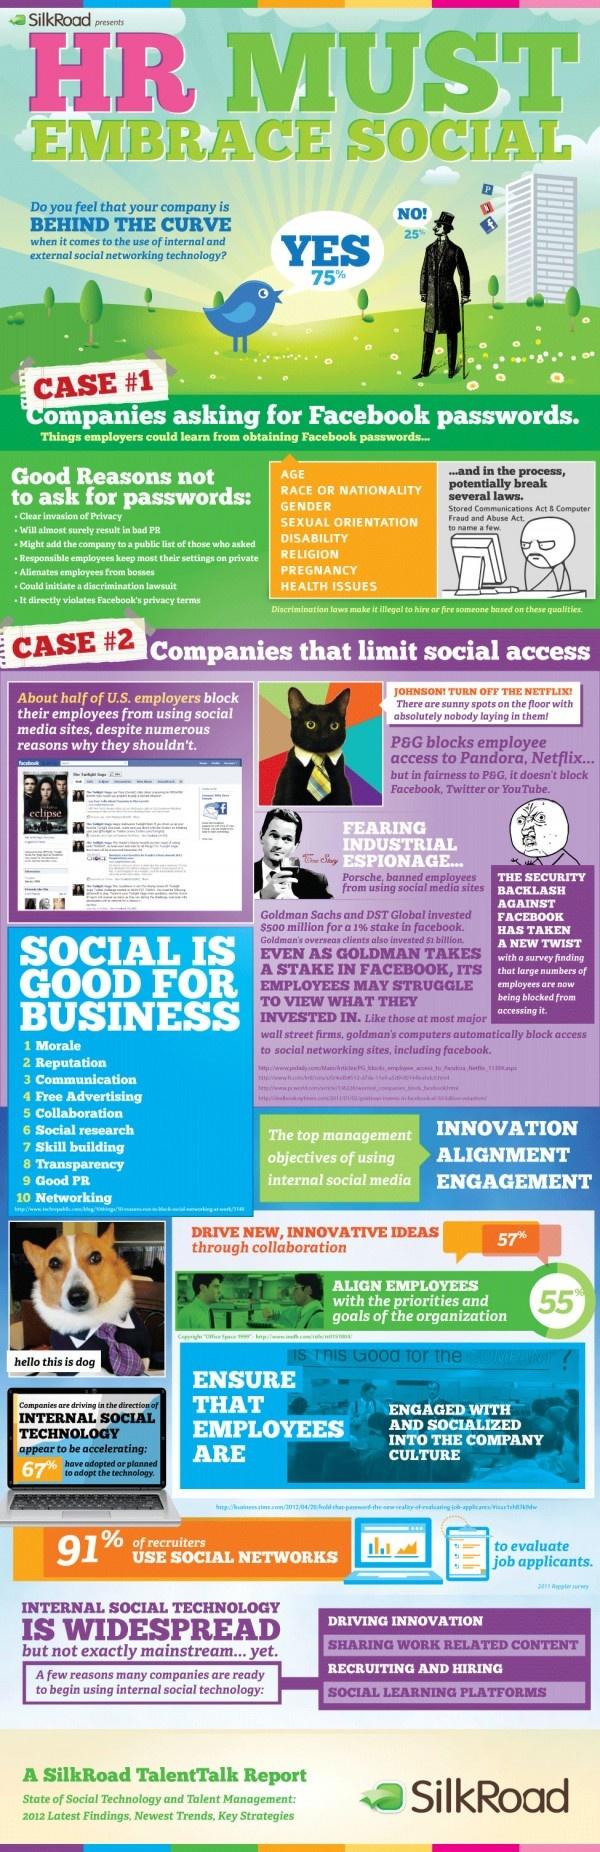 Why HR Must Embrace Social Media: Social Network, Human Resources, Website, Web Site, Social Media, Talent Management, Media Infographic, Embrace Social, Socialmedia